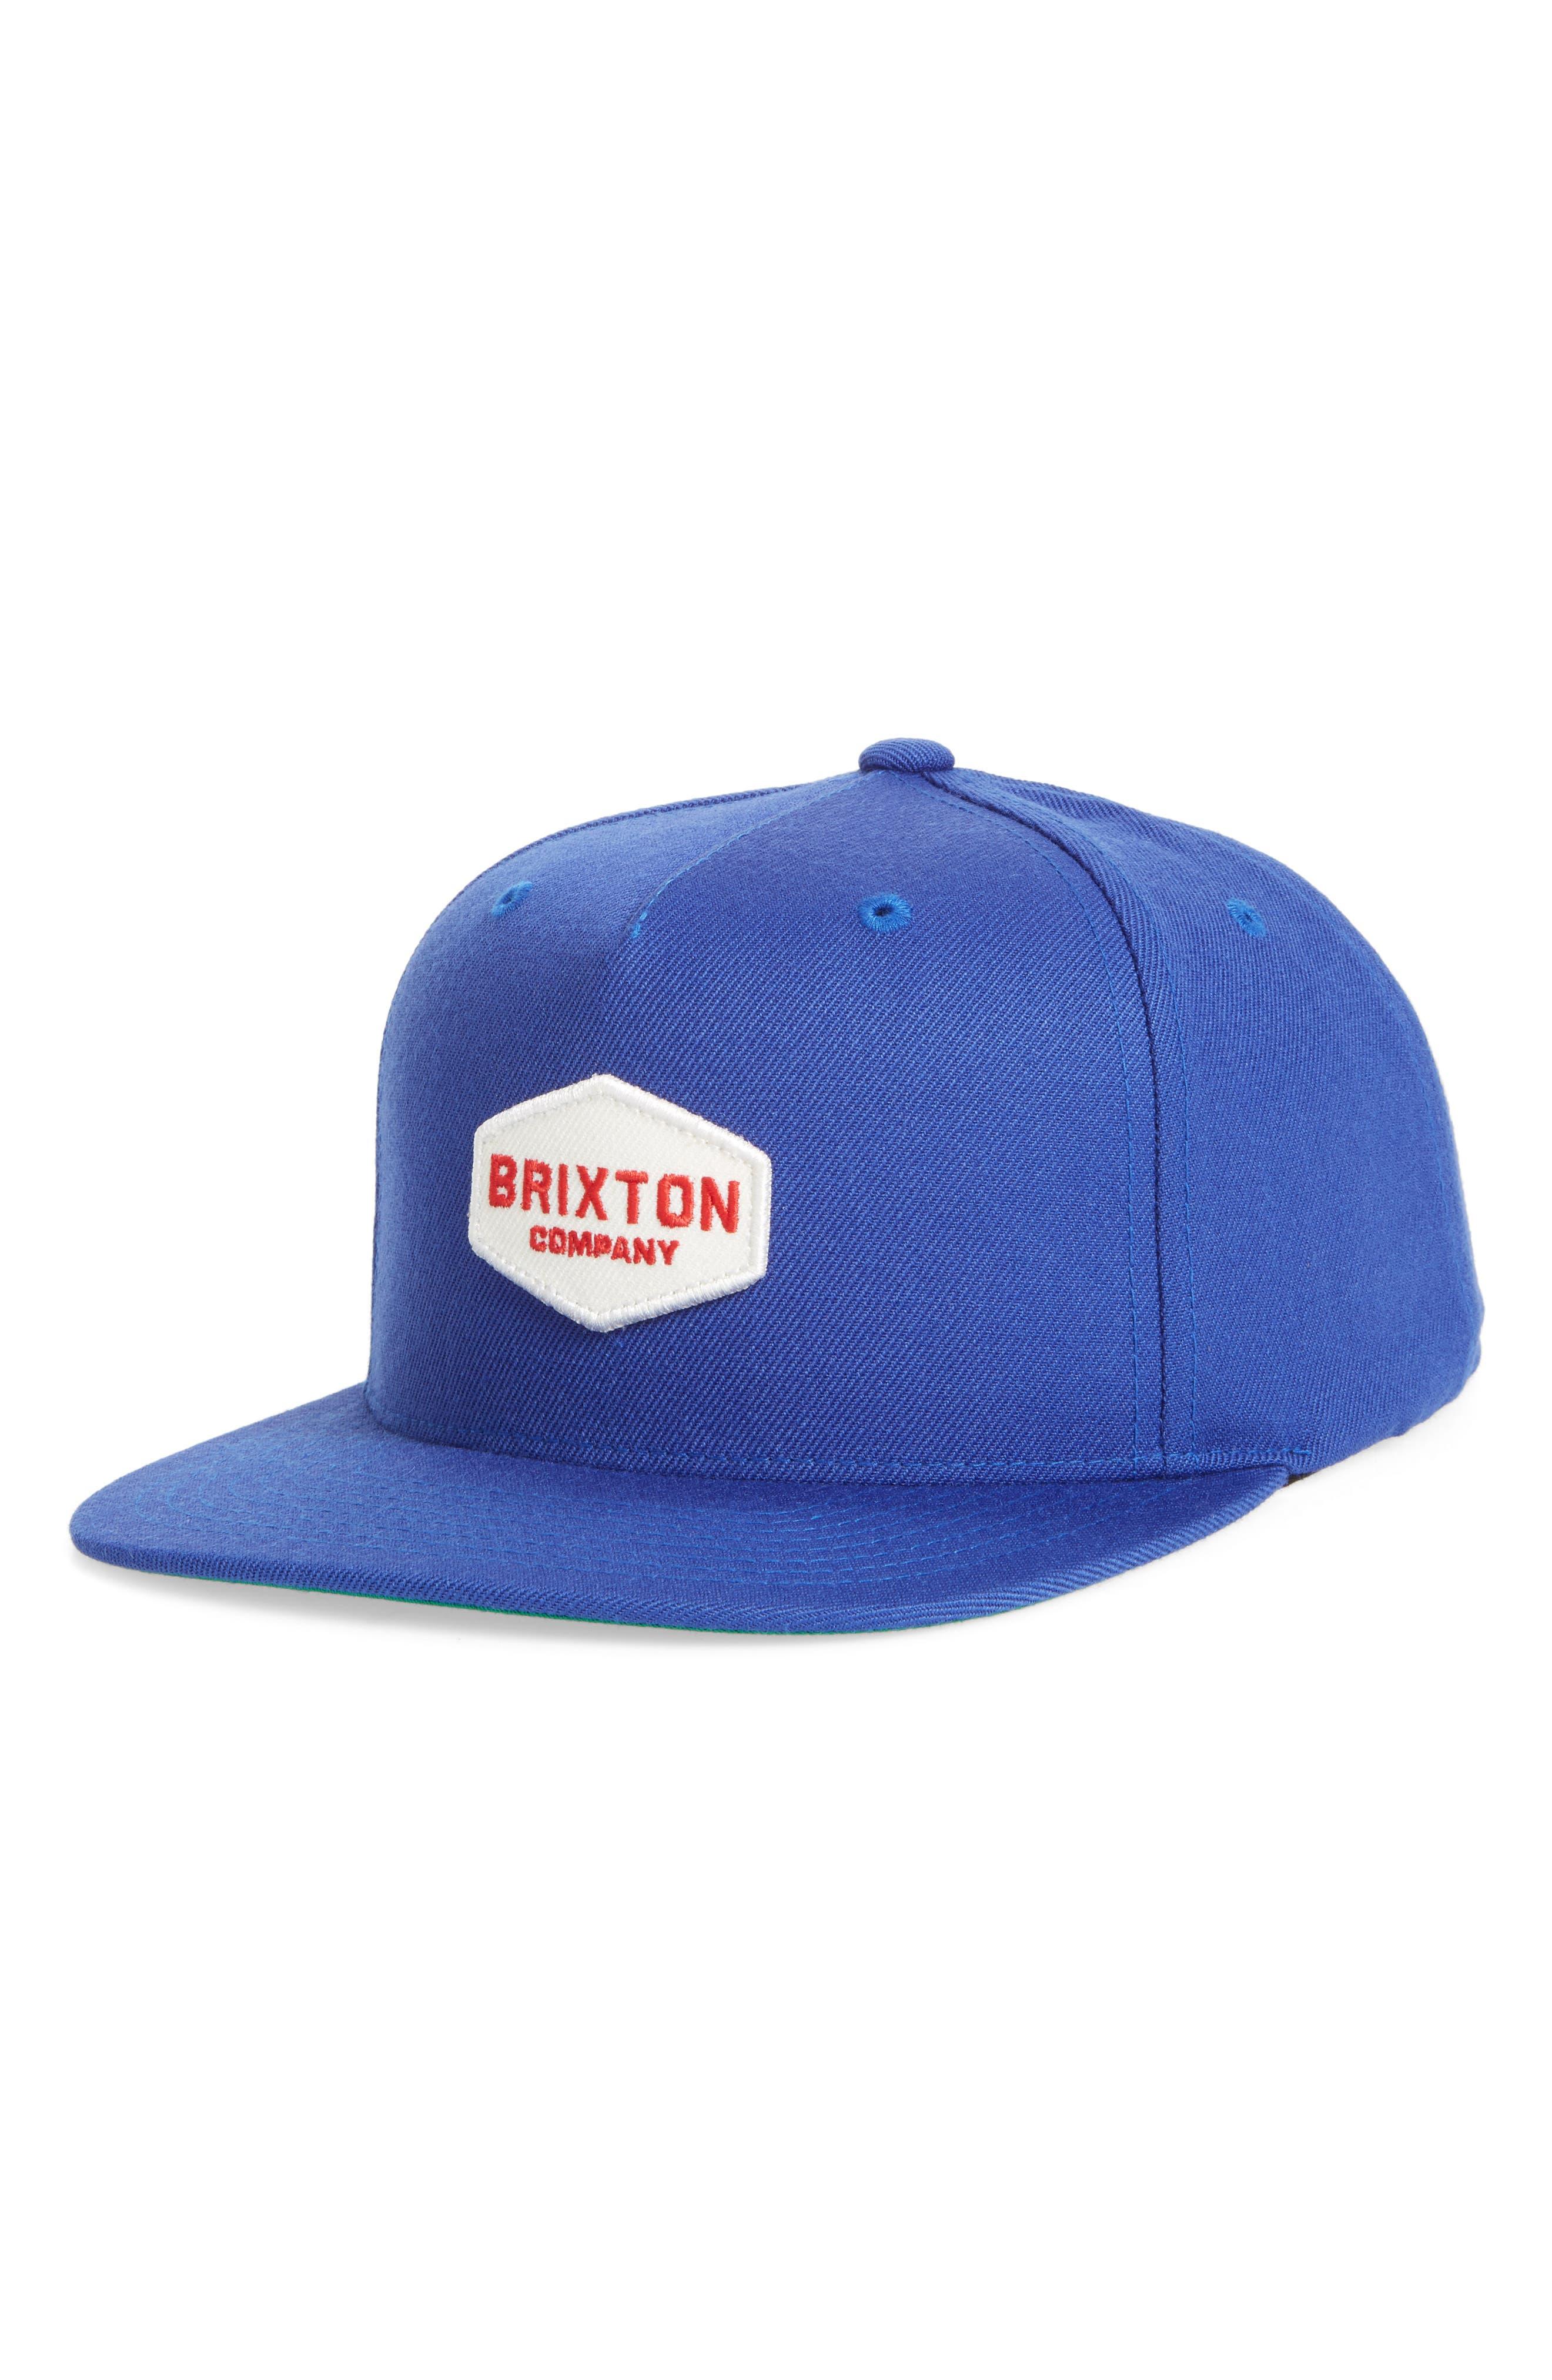 Brighton Obtuse Snapback Baseball Cap